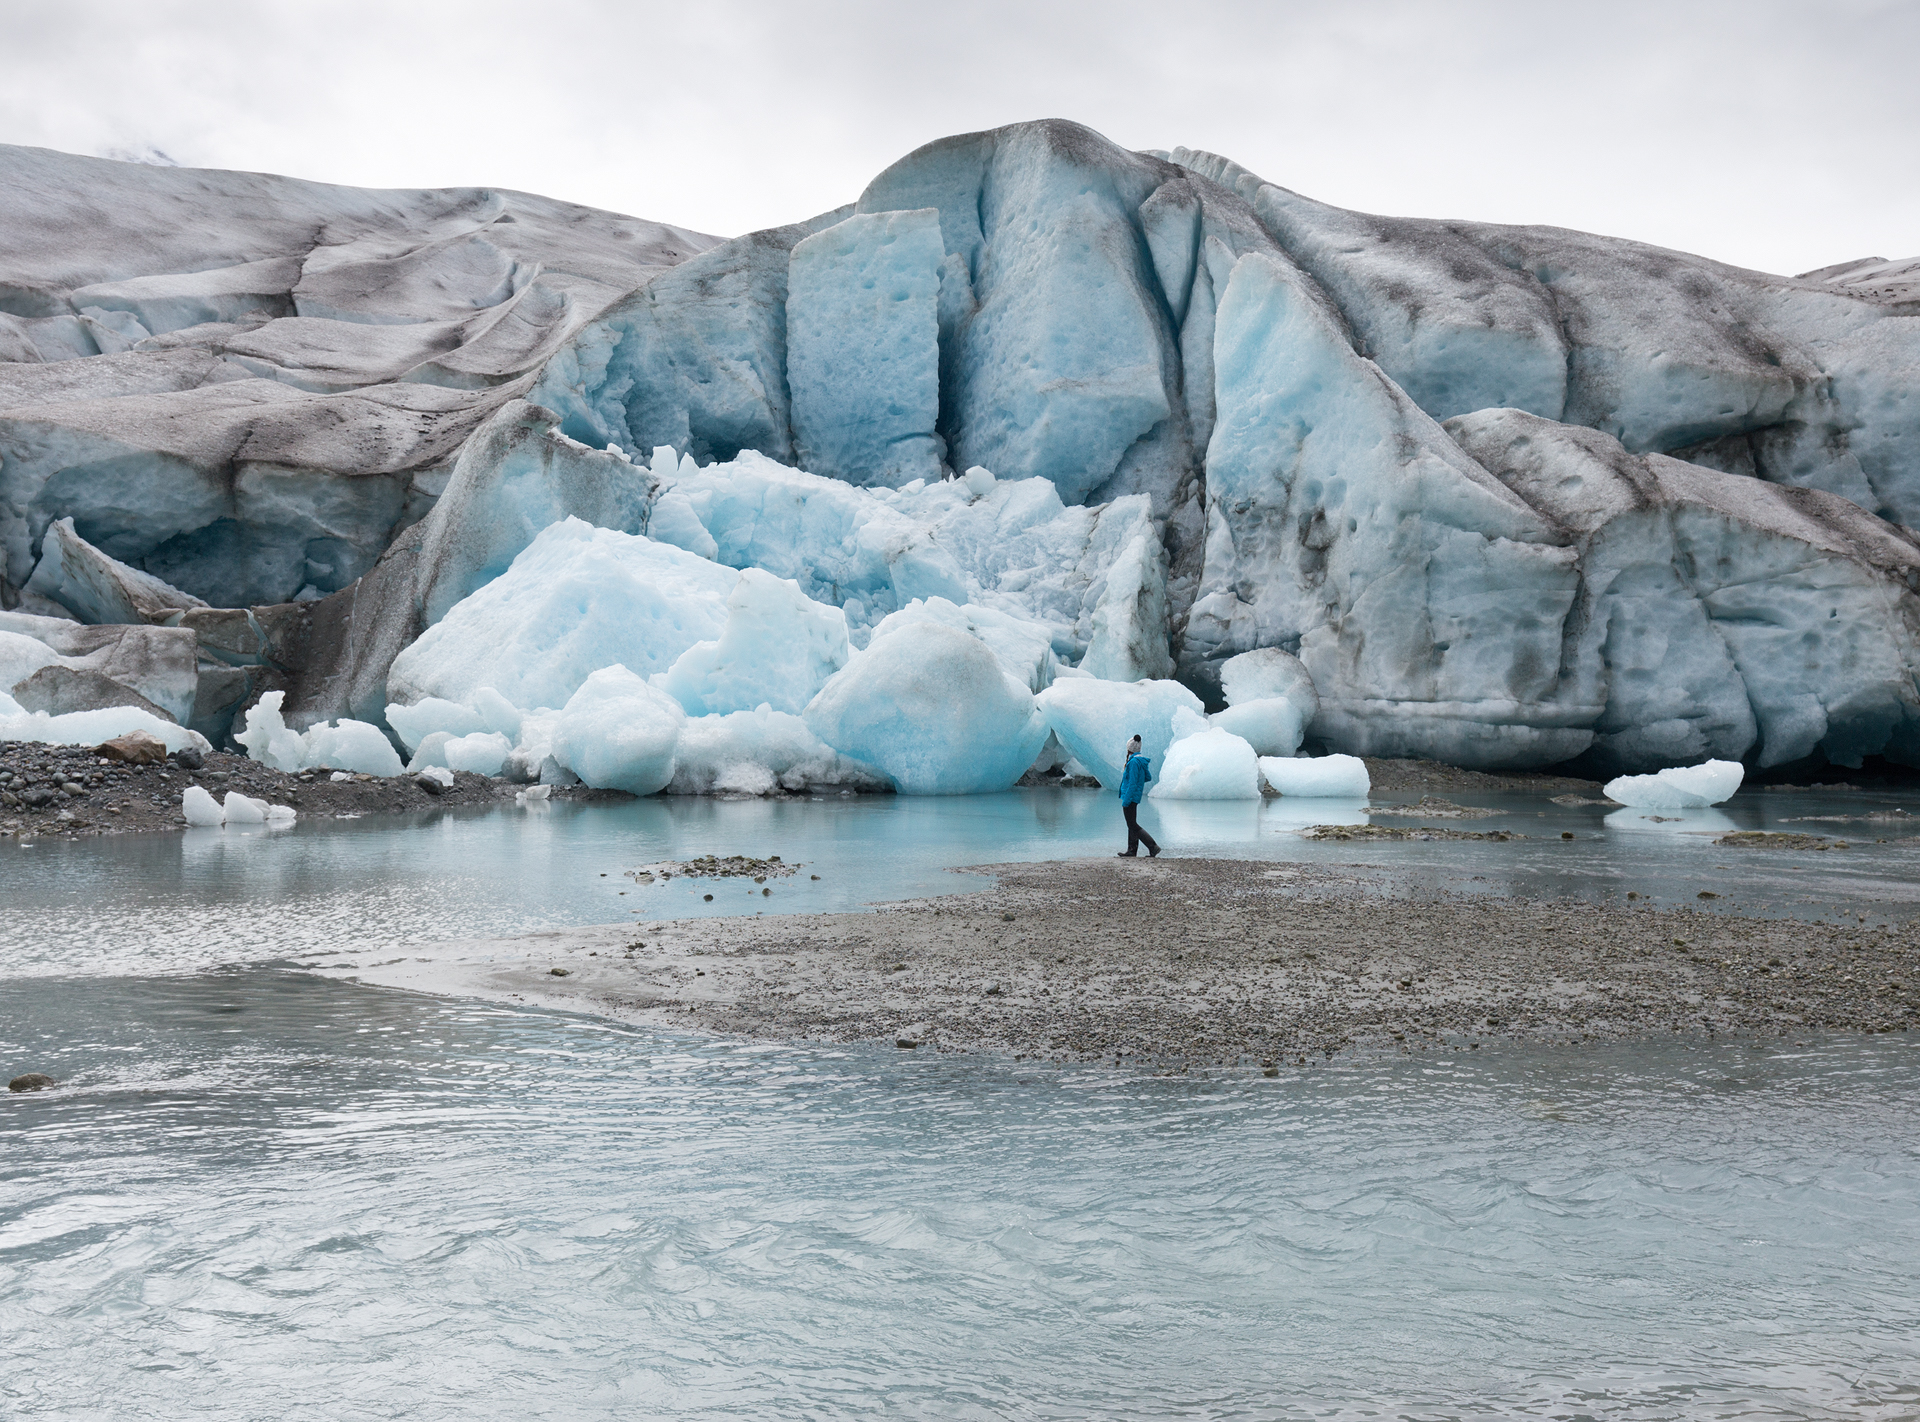 Exploring Reid Glacier at low tide